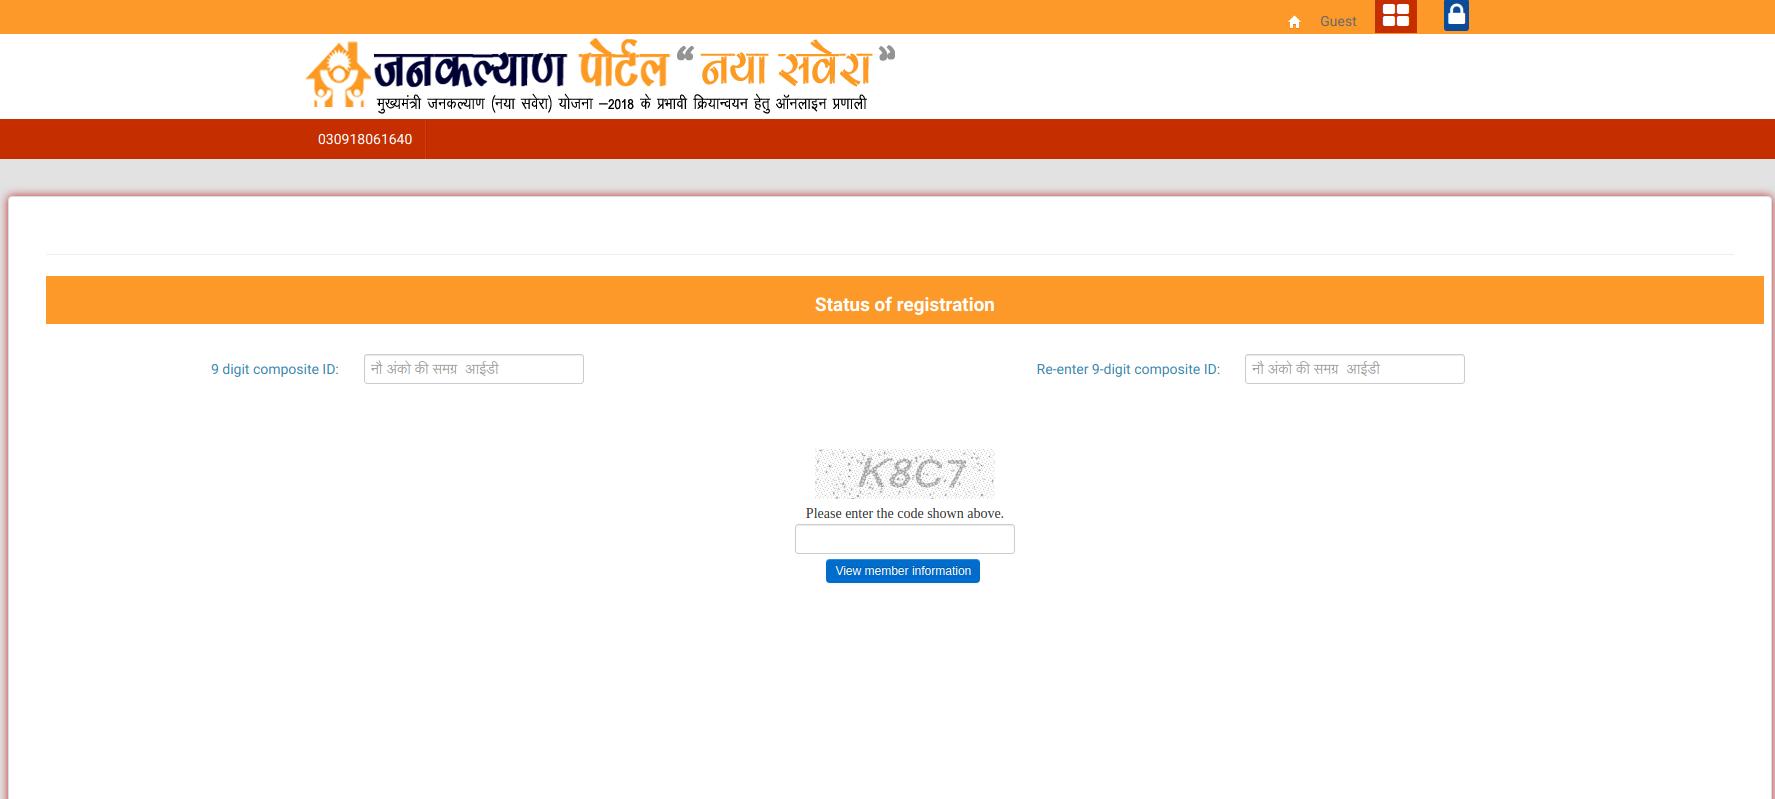 Mukhyamantri Asangathi Mazdoor Kalyan Yojana - Track Application